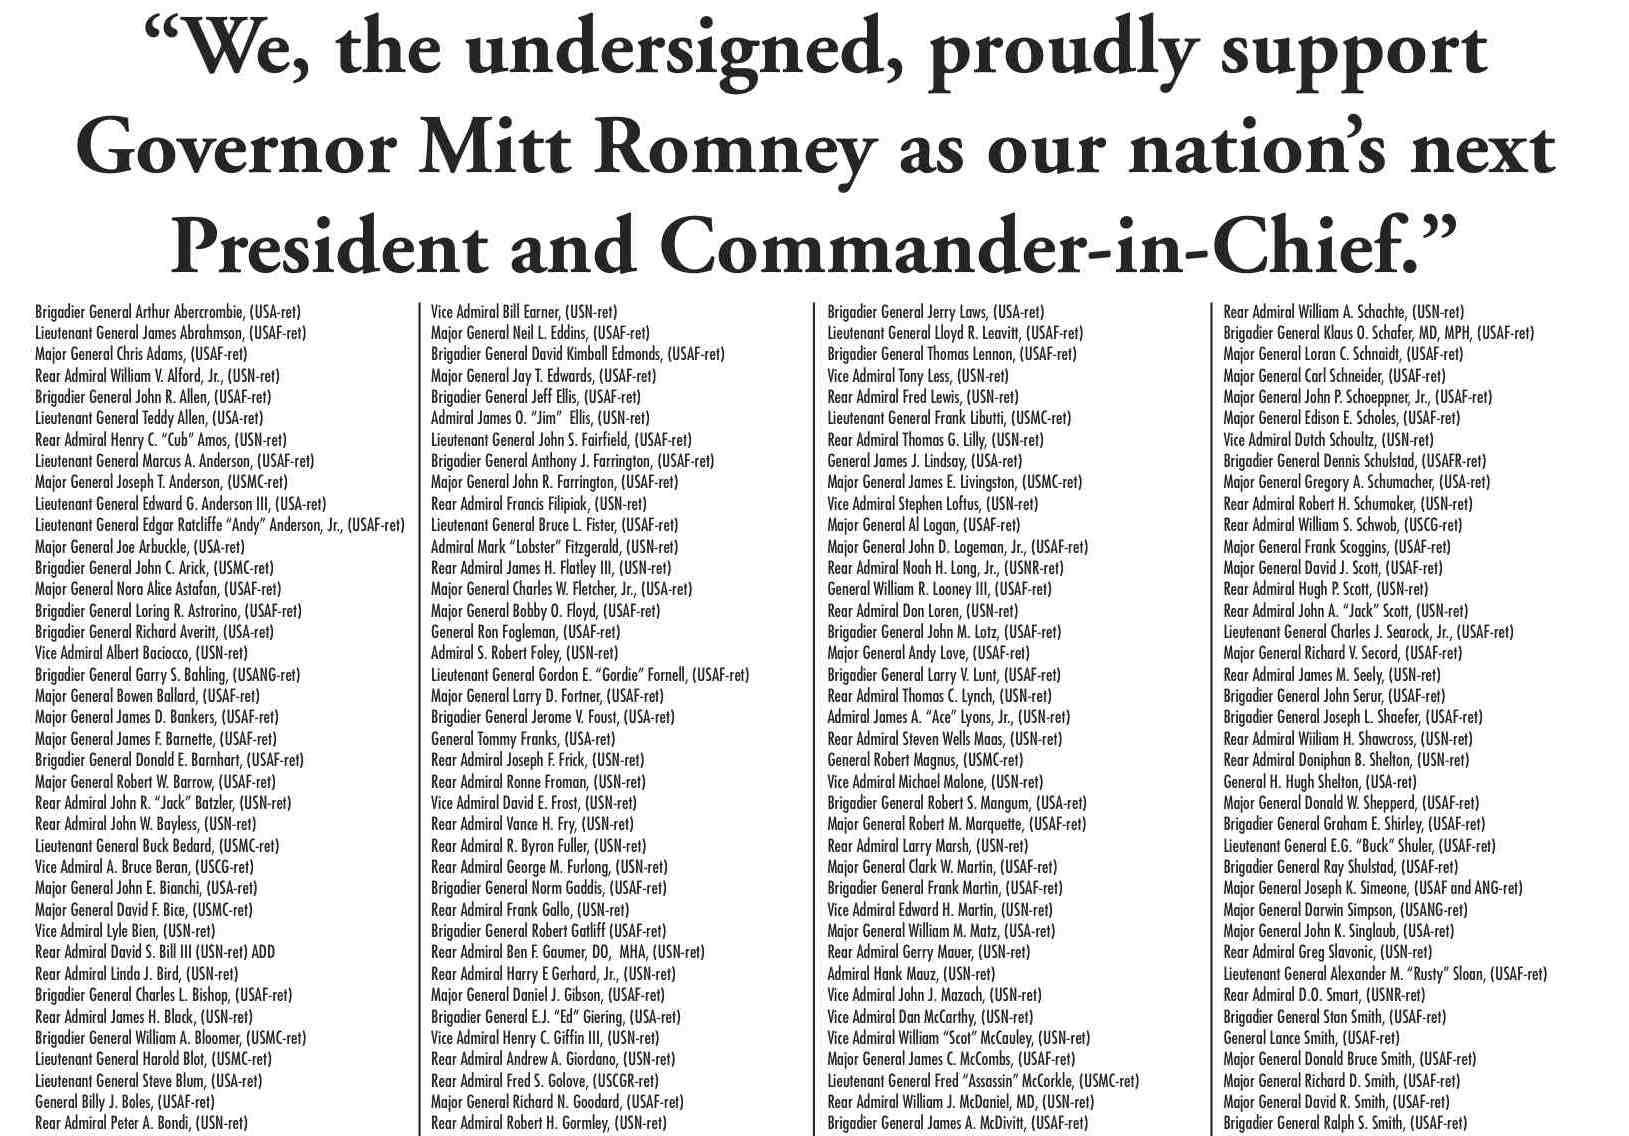 500 Admirals, Generals Endorse Romney